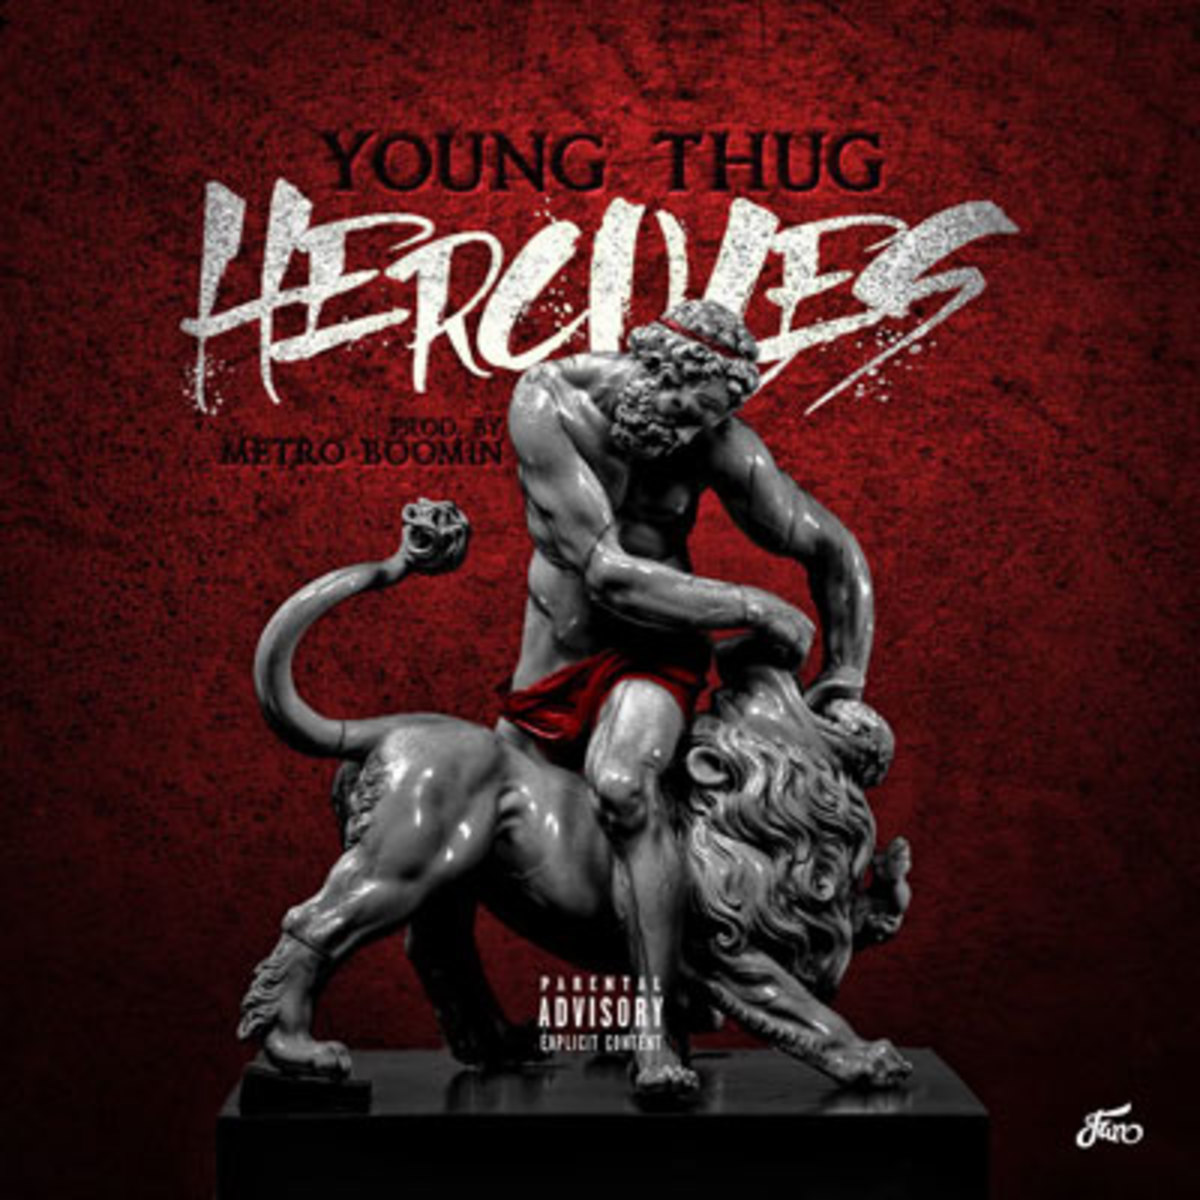 young-thug-hercules.jpg